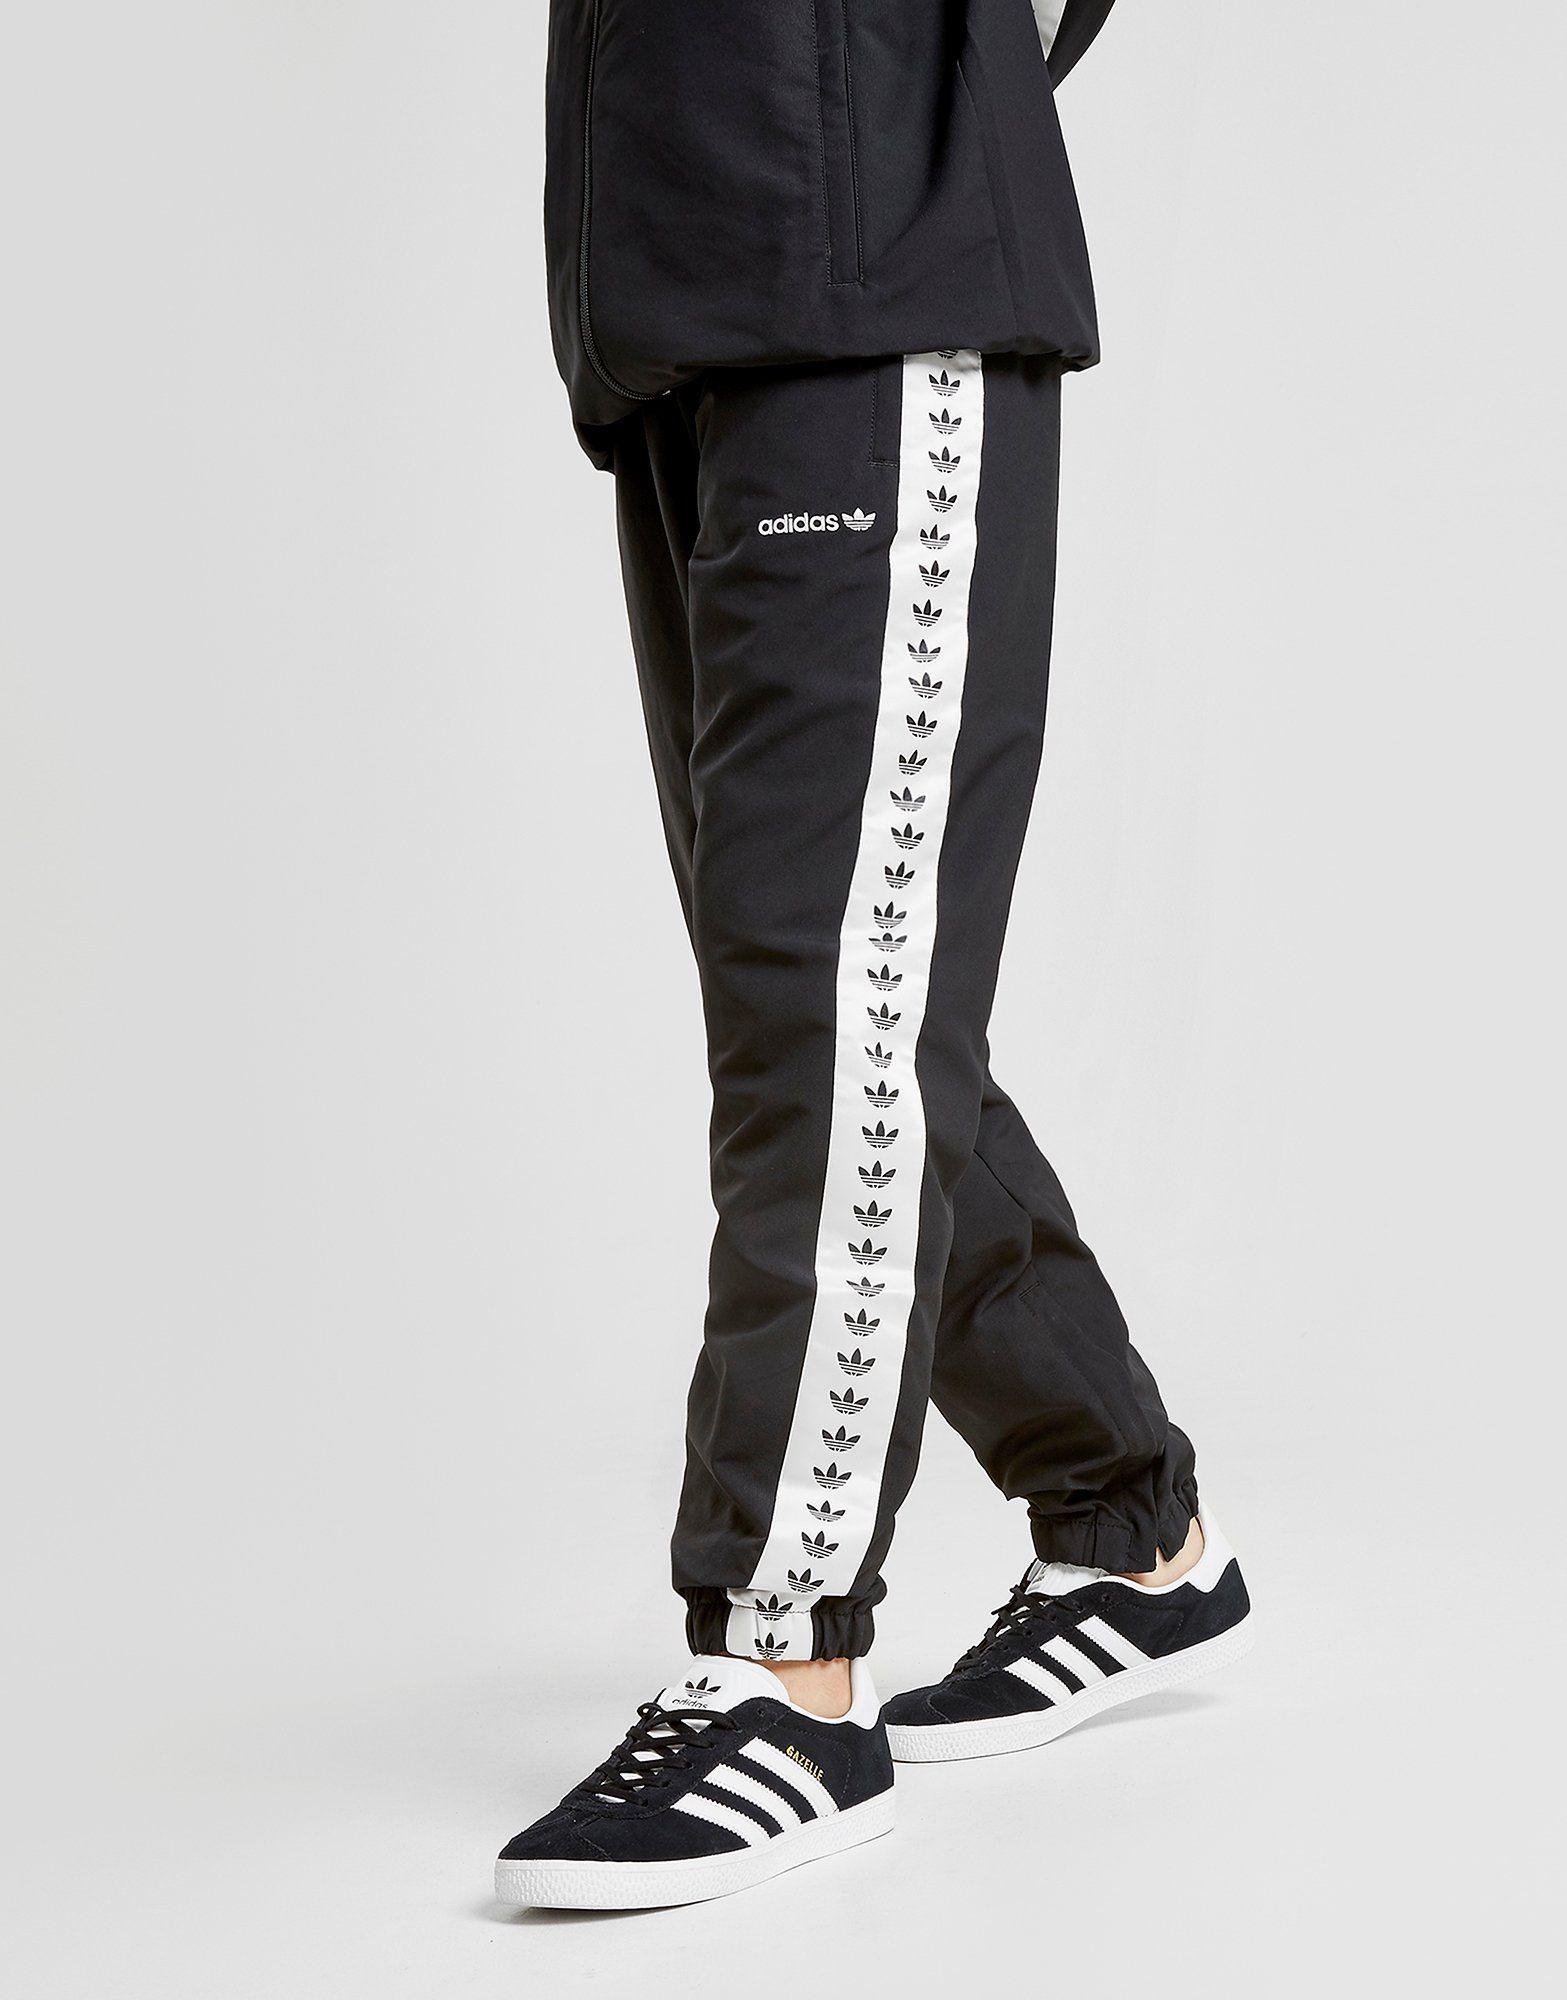 adidas Originals Tape Woven Track Pants